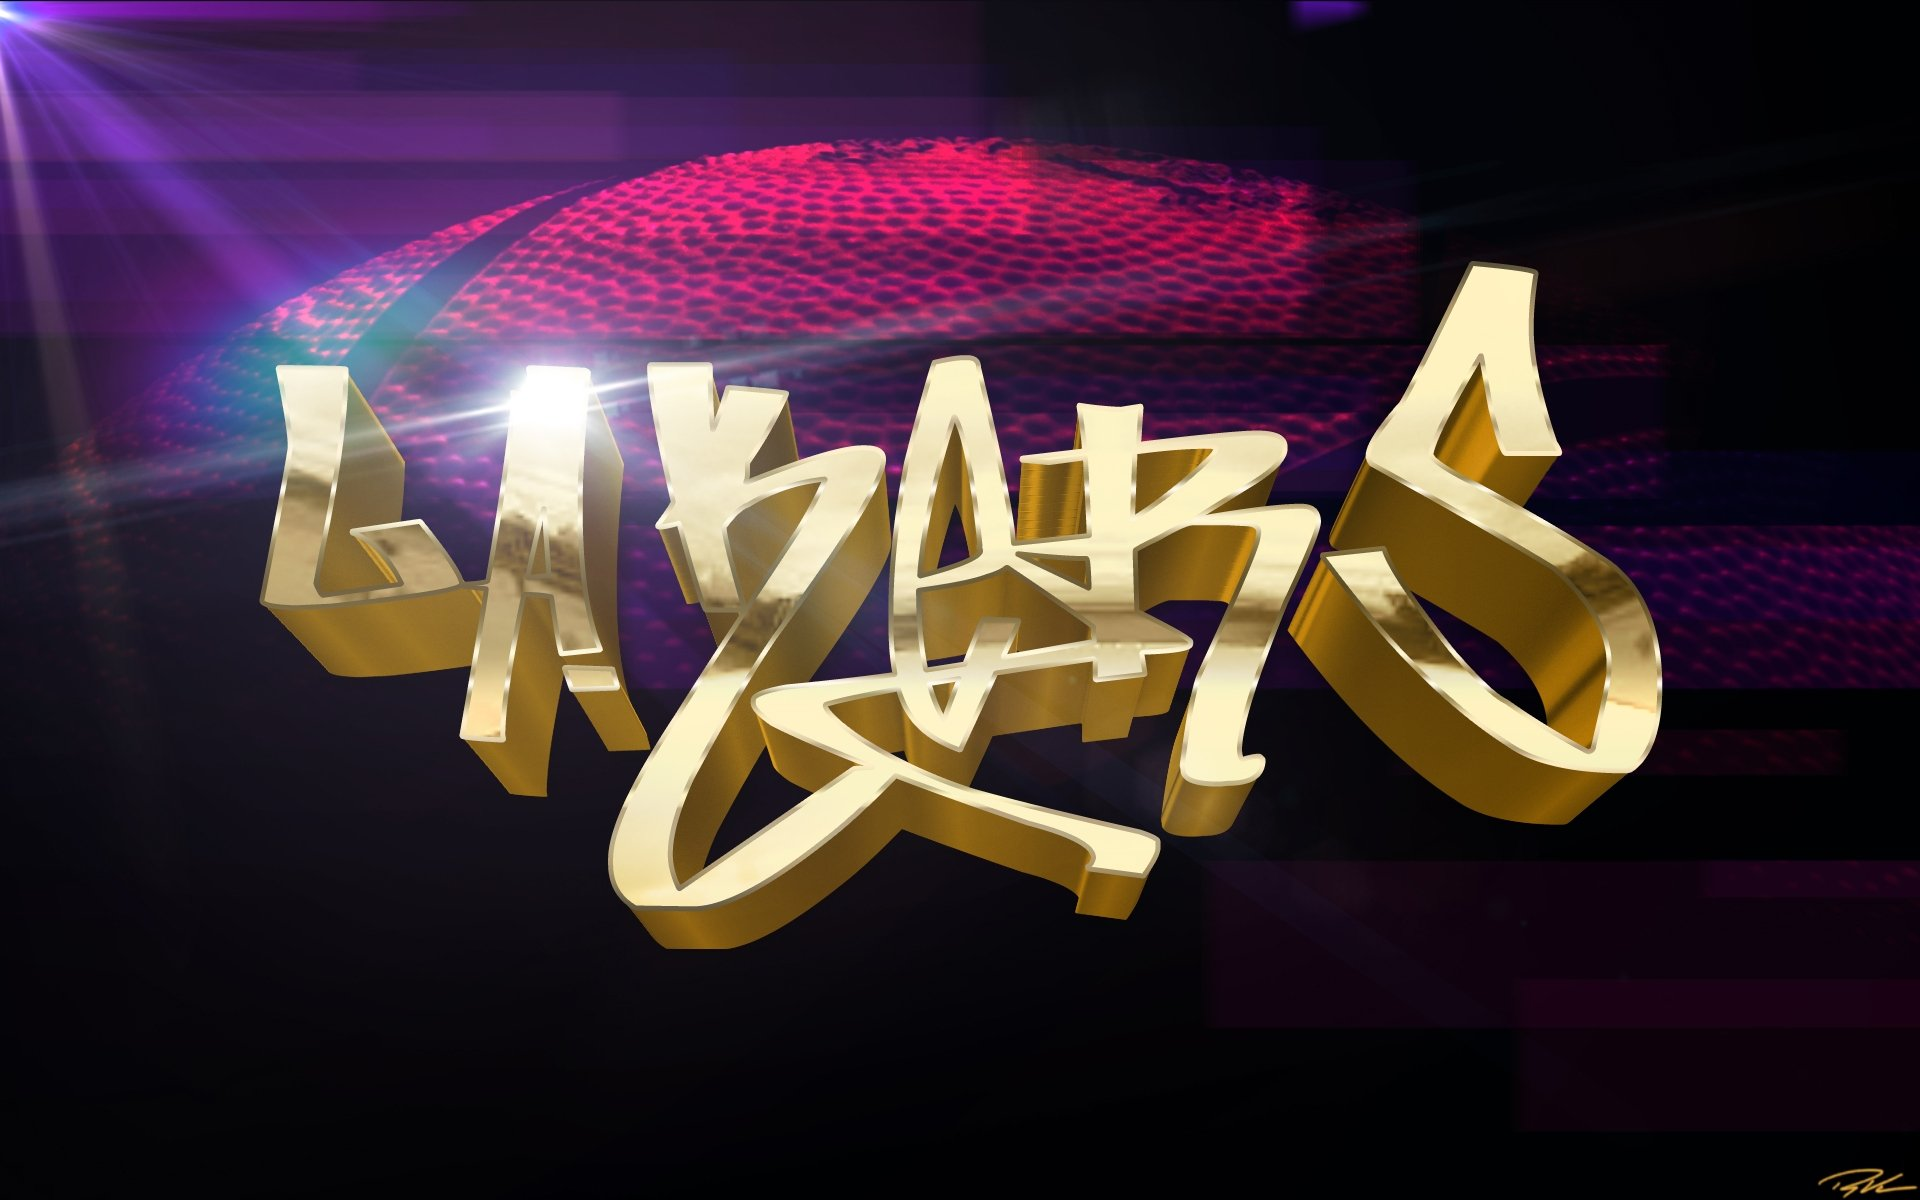 Los Angeles Lakers Wallpaper Hd Lakers Logo Wallpapers Pixelstalk Net